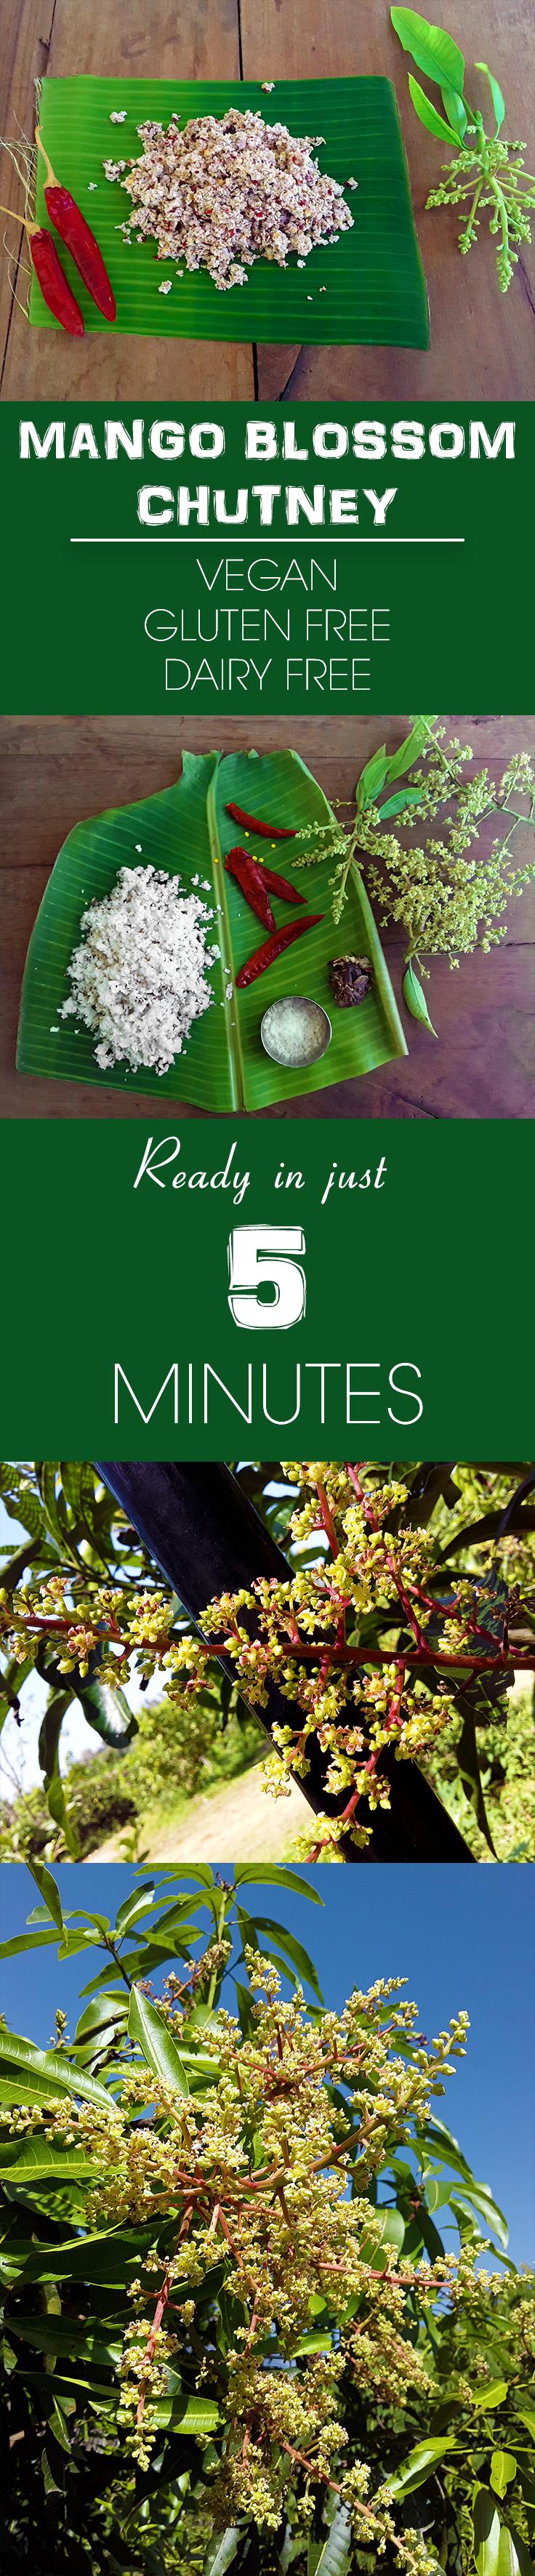 Mango Blossom Chutney - A traditional Konkani hot and tangy, vegan, gluten-free mango blossoms and coconut chutney. A five minute recipe.